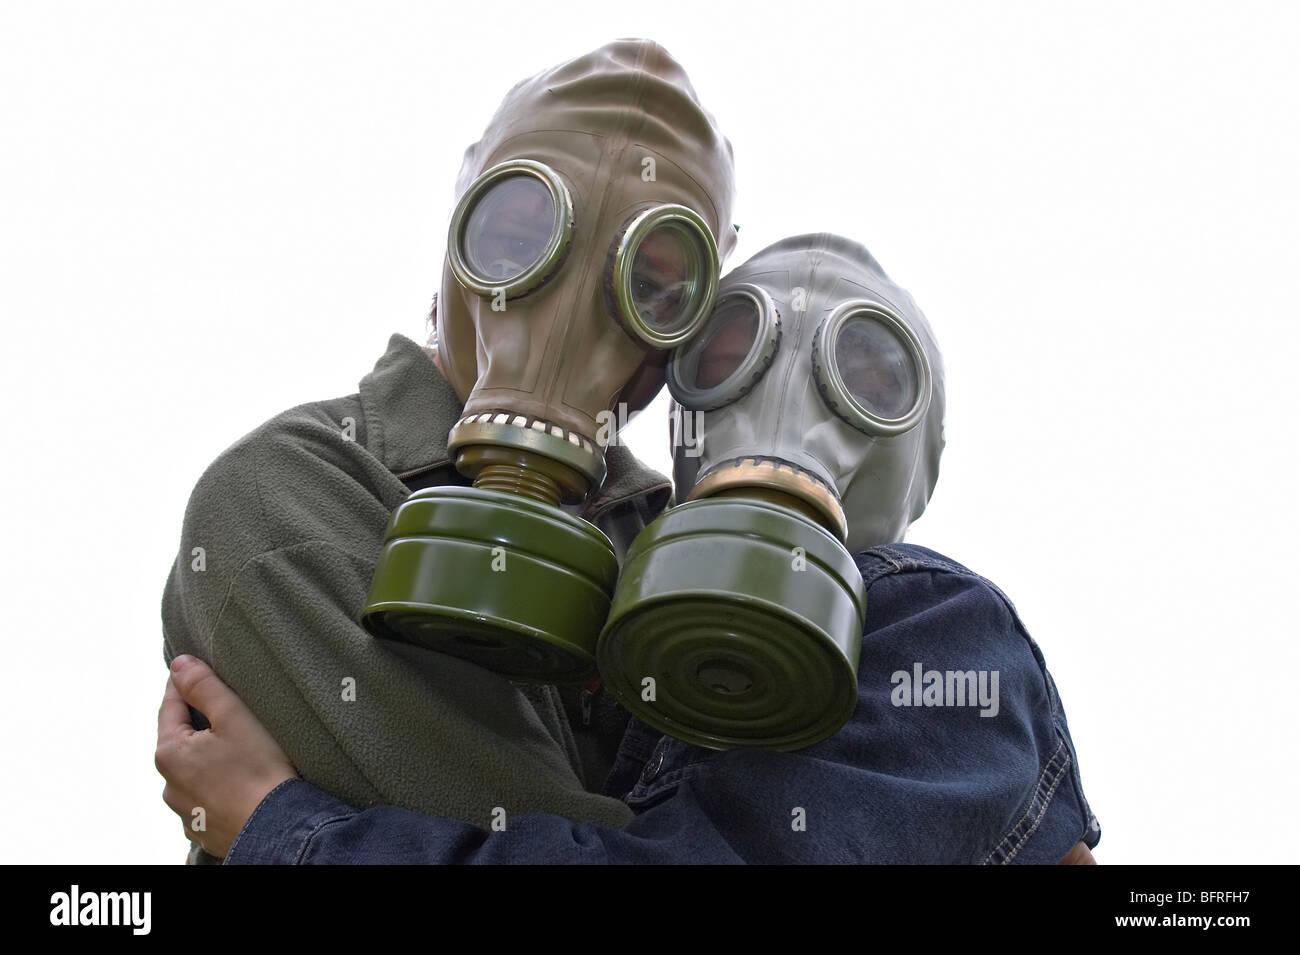 39 39 gas mask 39 39 children stockfotos 39 39 gas mask 39 39 children bilder alamy. Black Bedroom Furniture Sets. Home Design Ideas